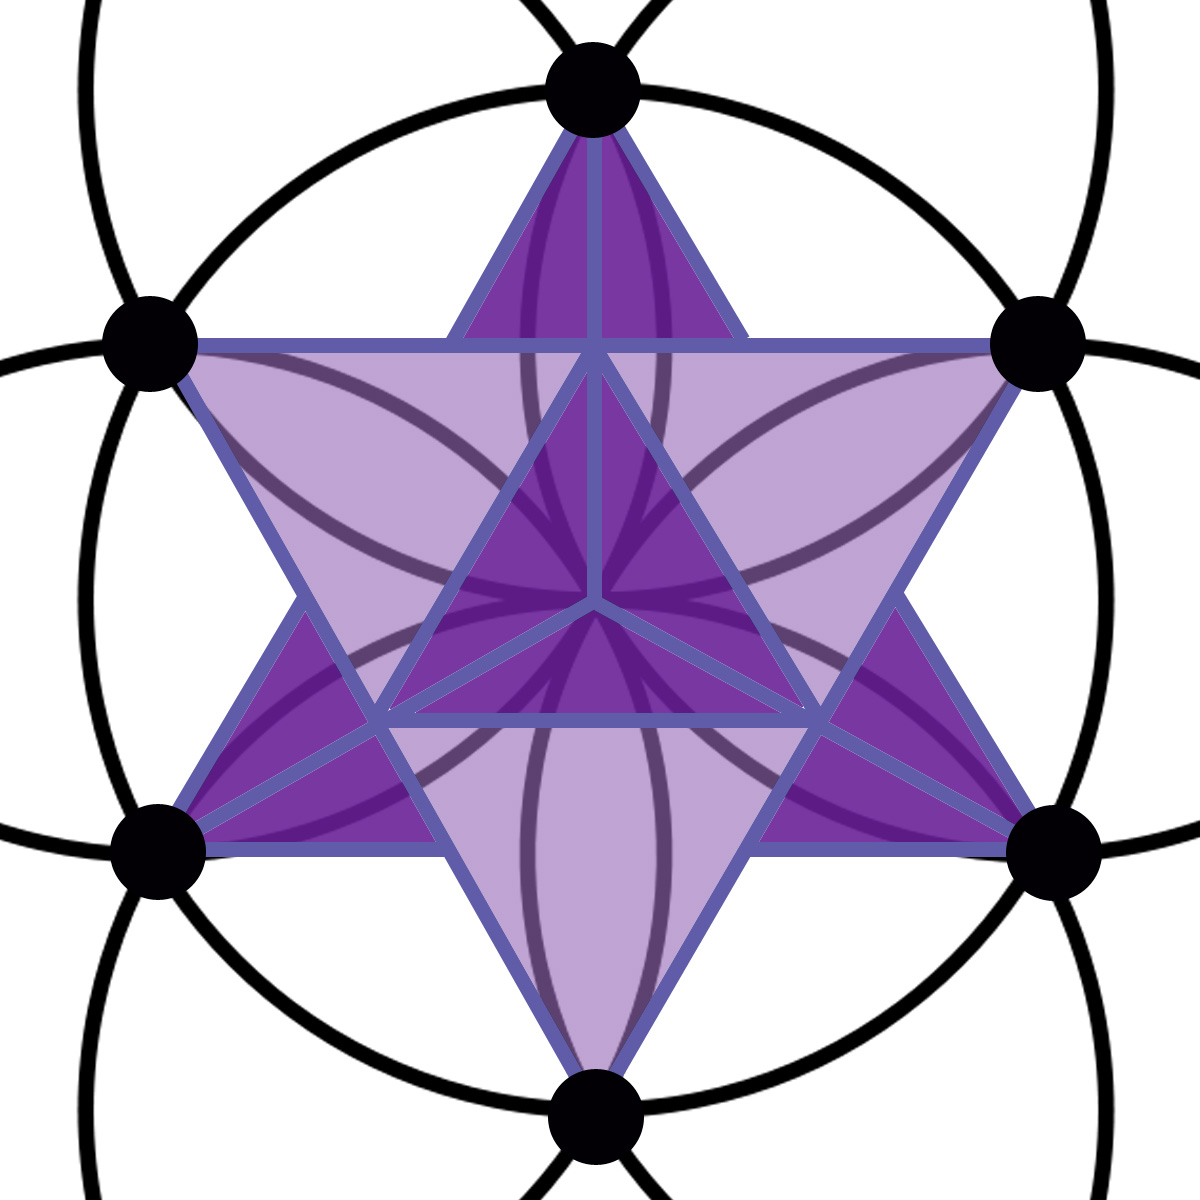 The seed of life and the vesica piscis purplemerkaba purplehexagramhexagon buycottarizona